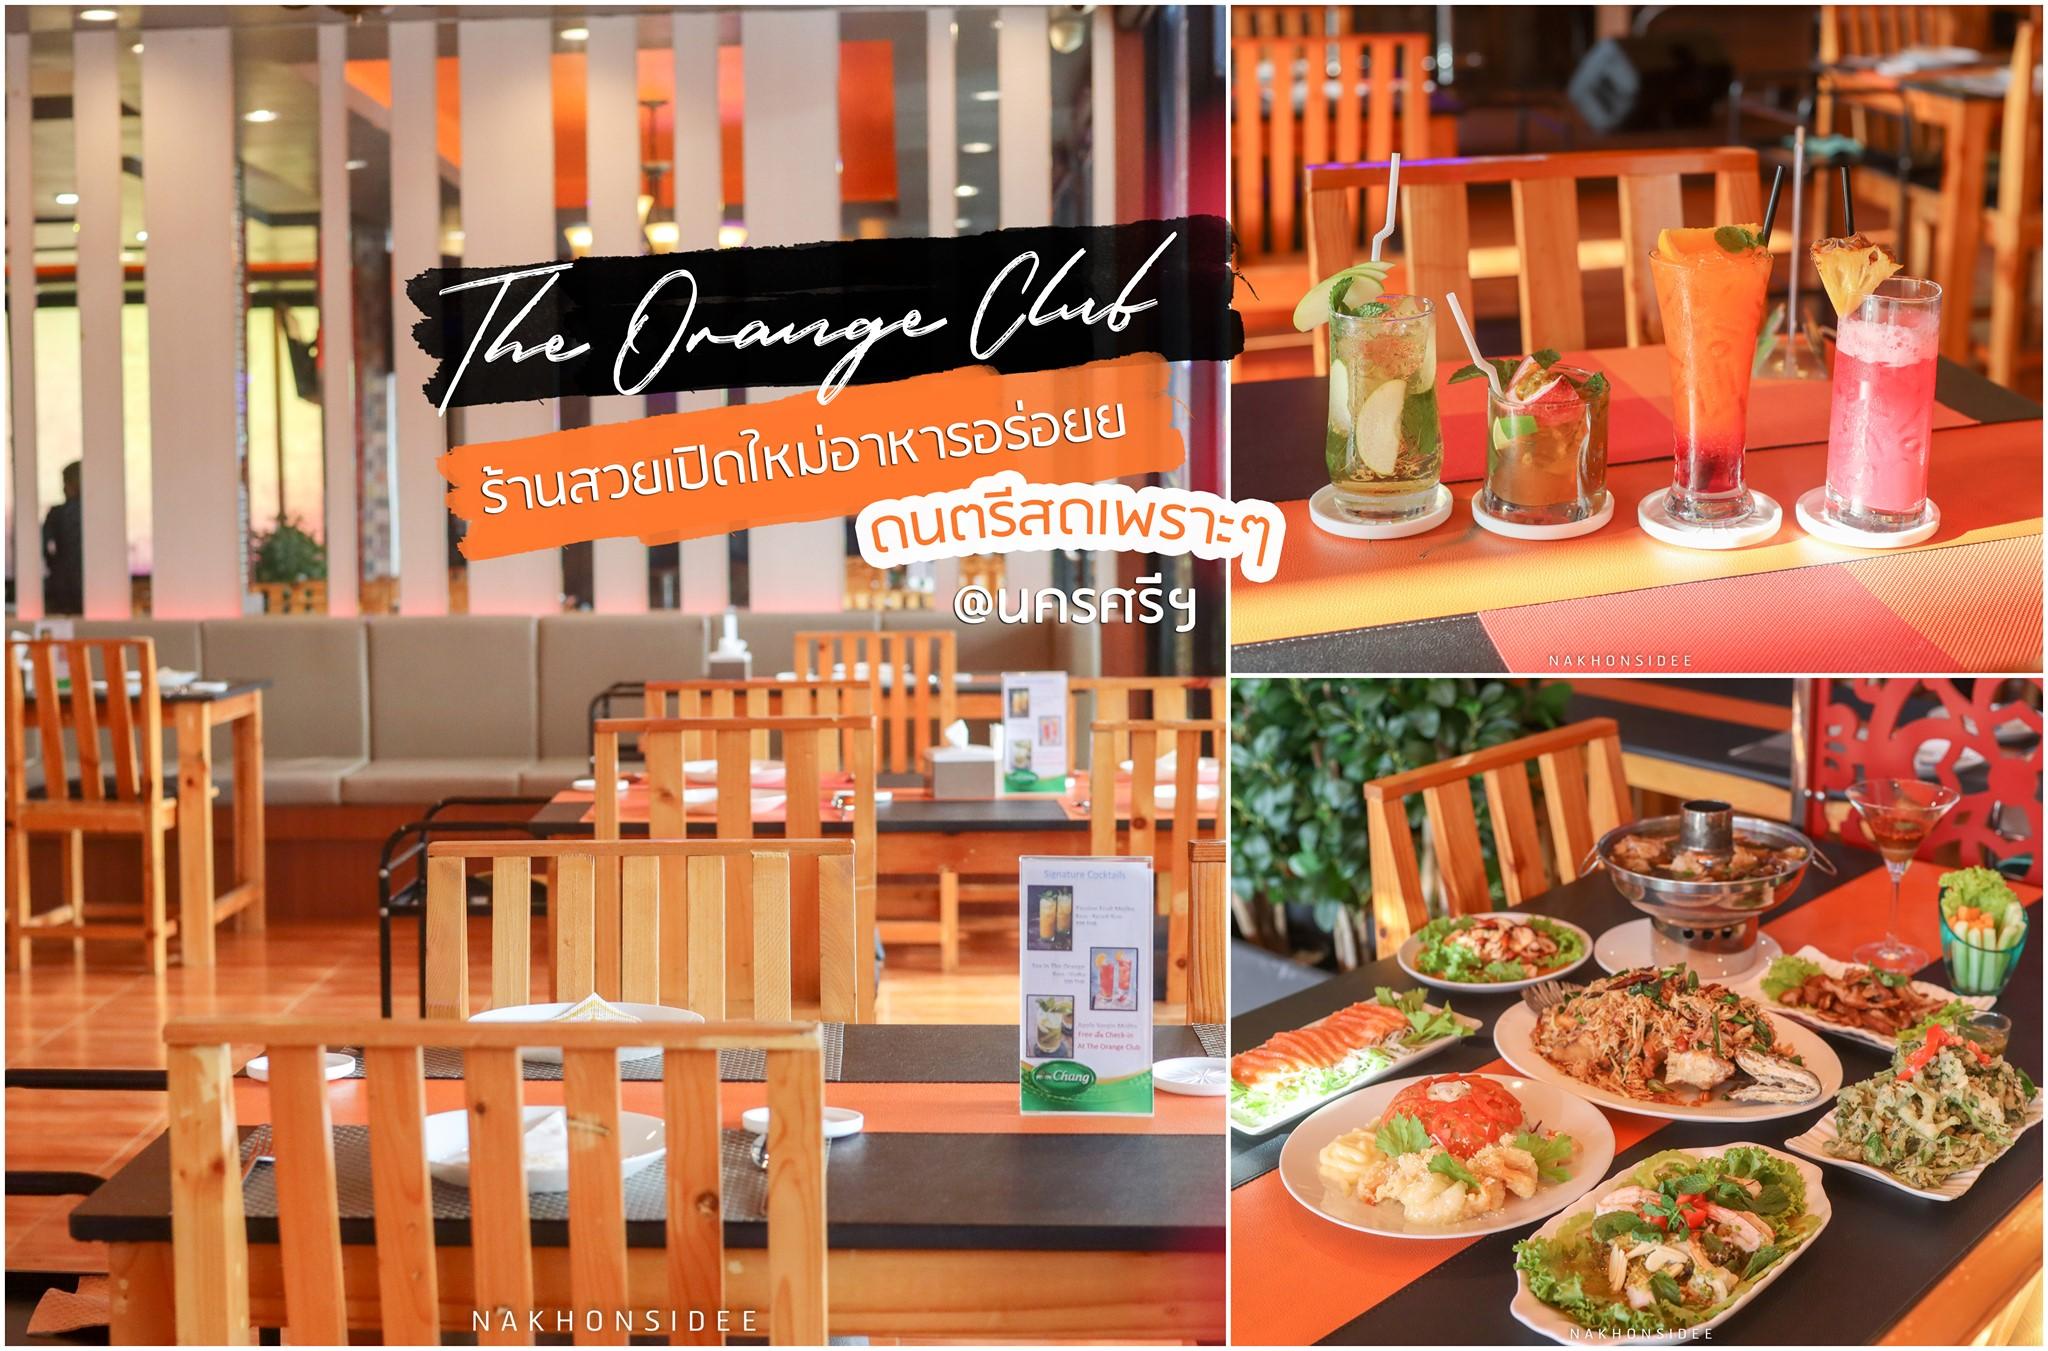 The Orange Club Life's Music ร้านเปิดใหม่นั่งชิวๆ อาหารอร่อยมวากกก ดนตรีสดเพราะๆ คอนเฟิร์มว่าดีย์แน่นอน 10/10 ต้องห้ามพลาด !! at  อำเภอเมือง นครศรีธรรมราช